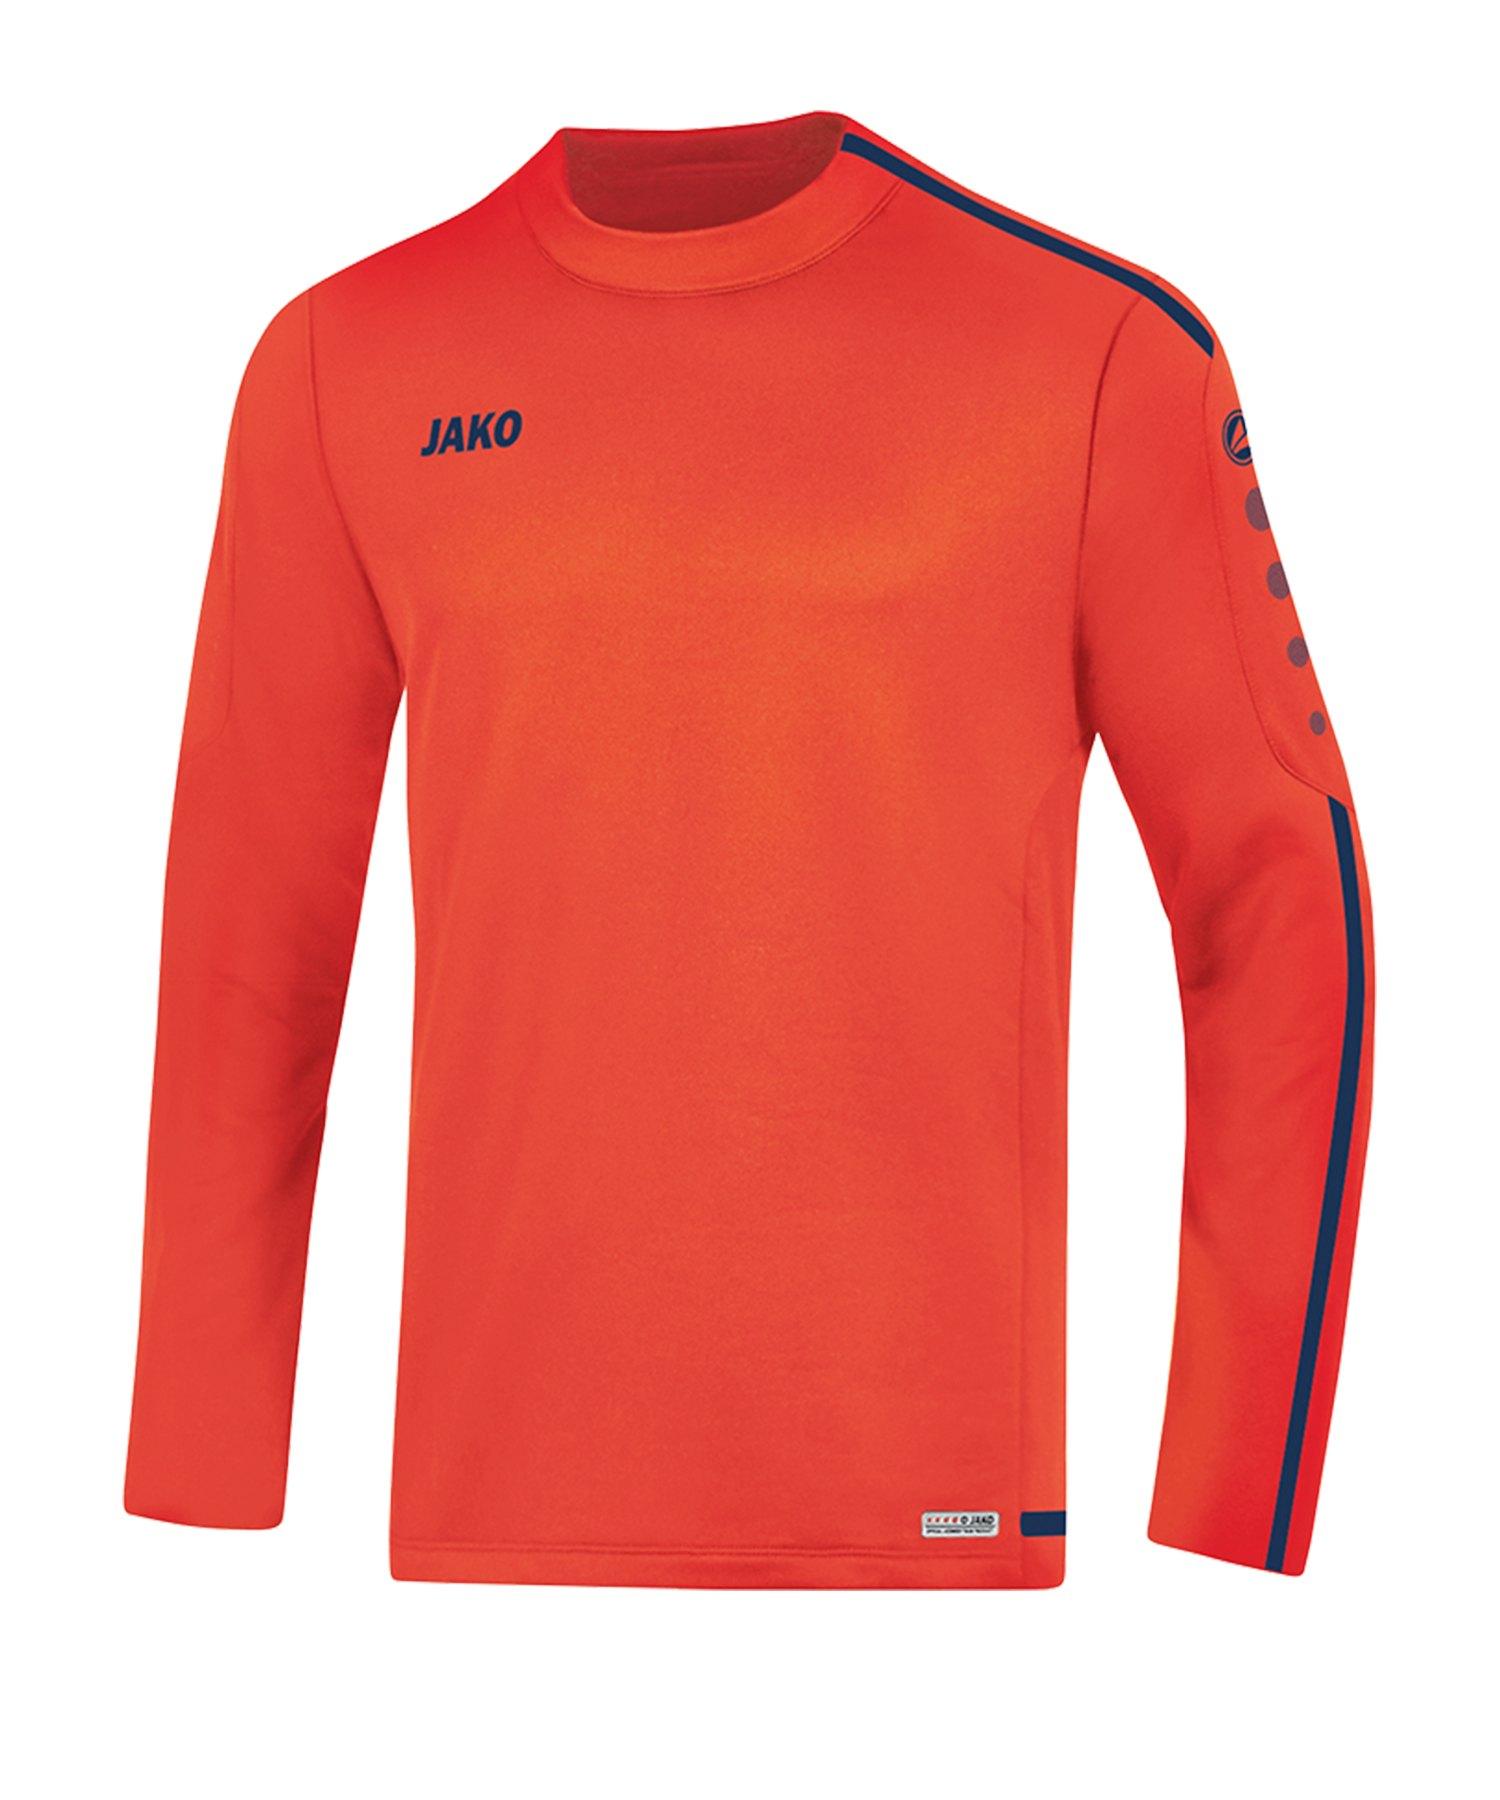 Jako Striker 2.0 Sweatshirt Orange Blau F18 - Orange